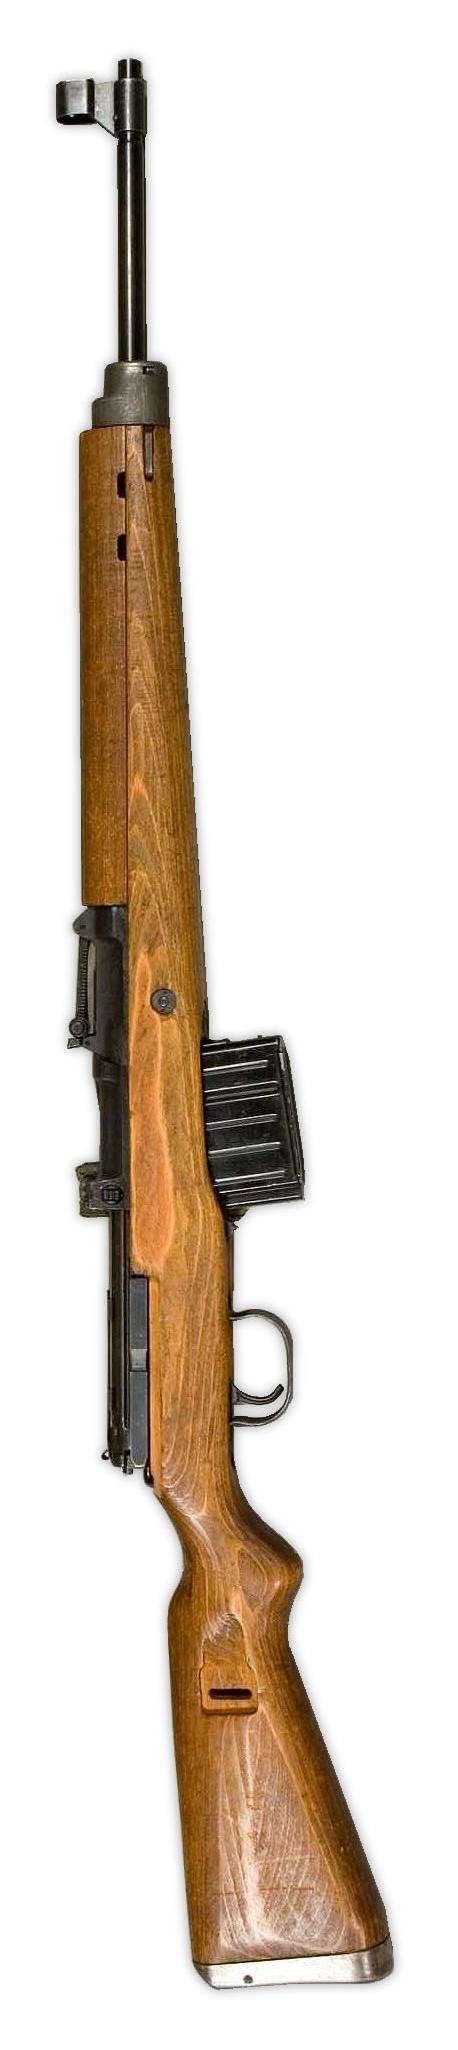 German Walther G43, circ. 1943-44. Germany's WWII response to America's semi-auto 8-rnd capacity M1 Garand.